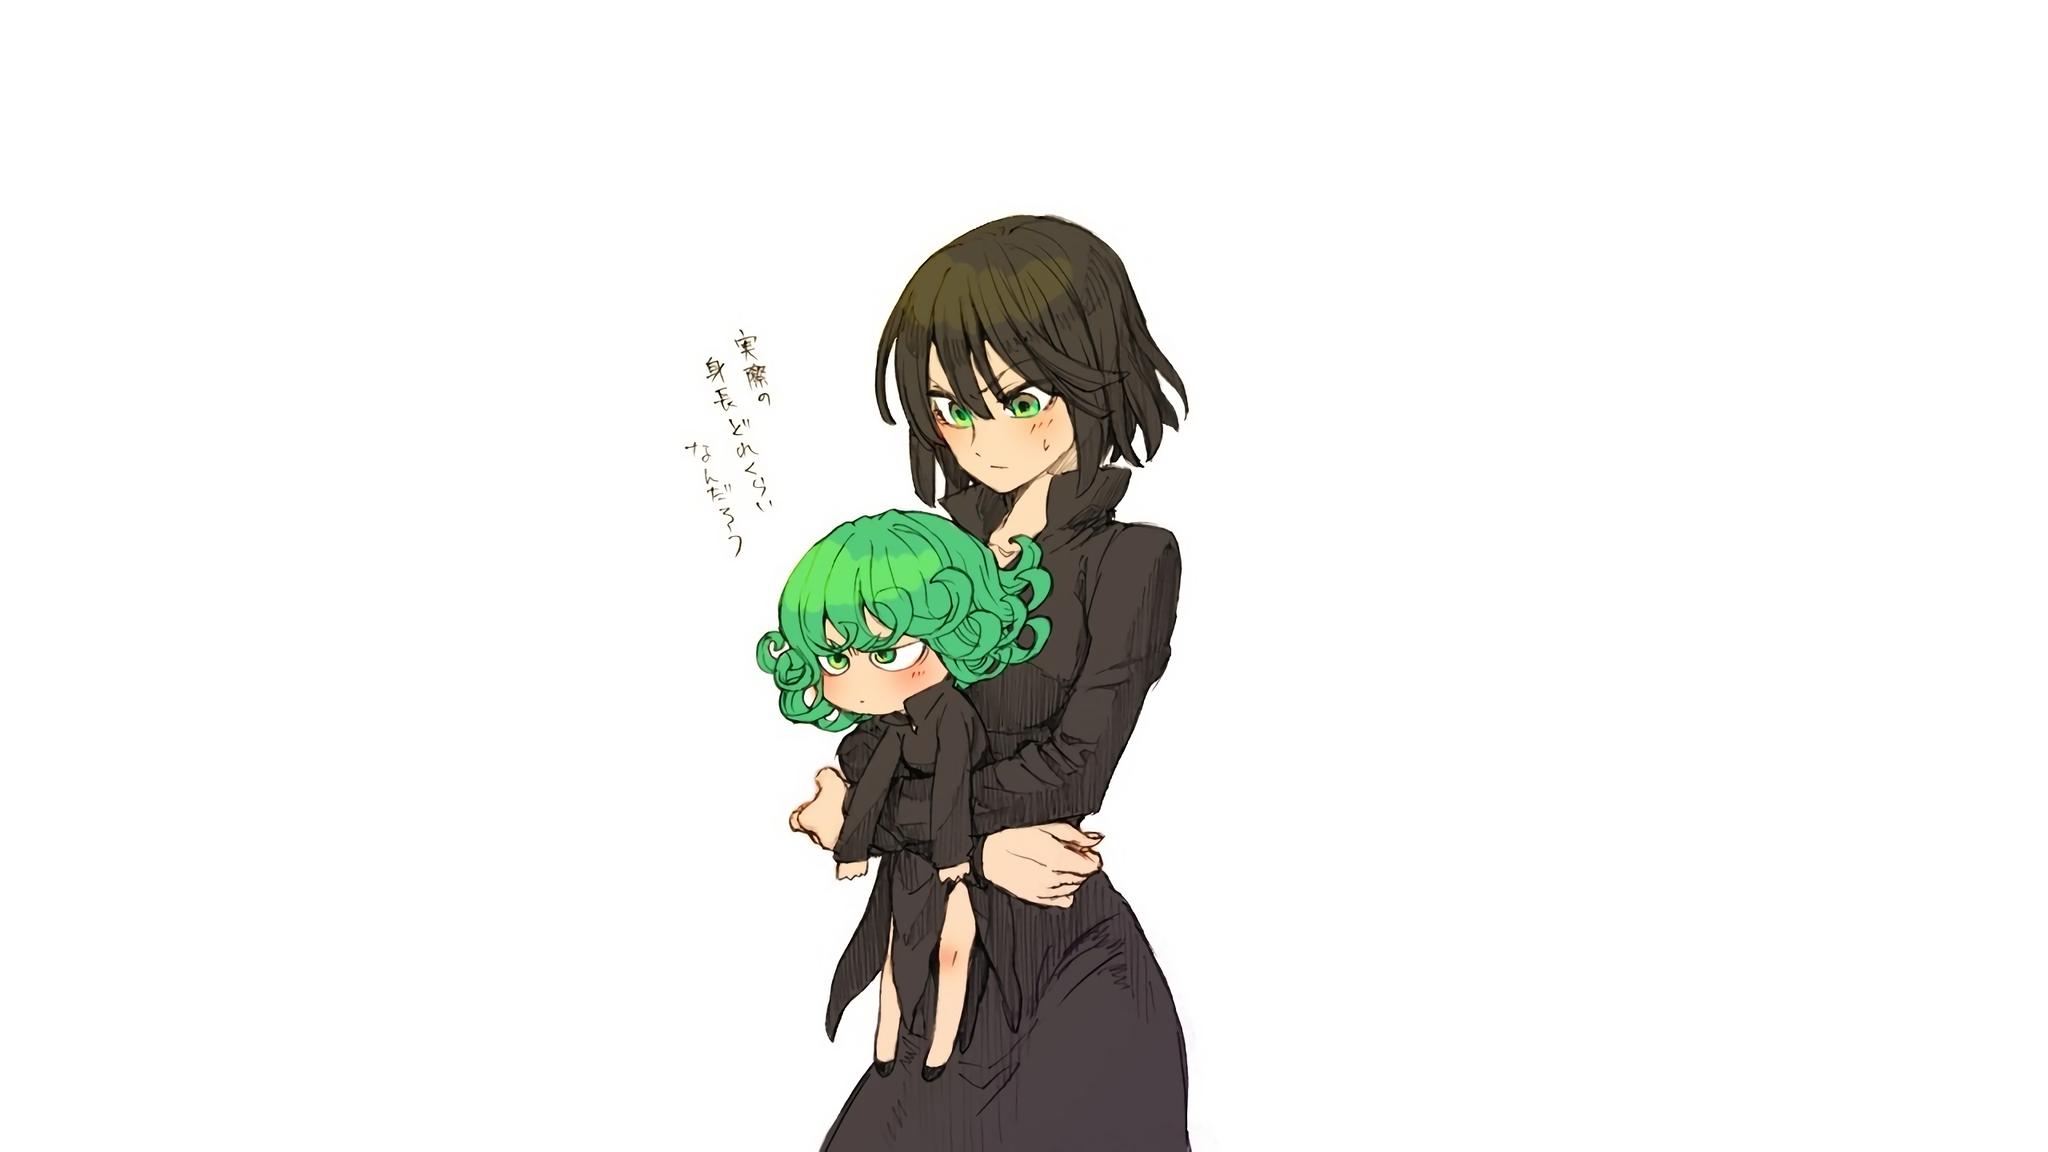 Wallpaper Illustration Anime Girls Fubuki Cartoon One